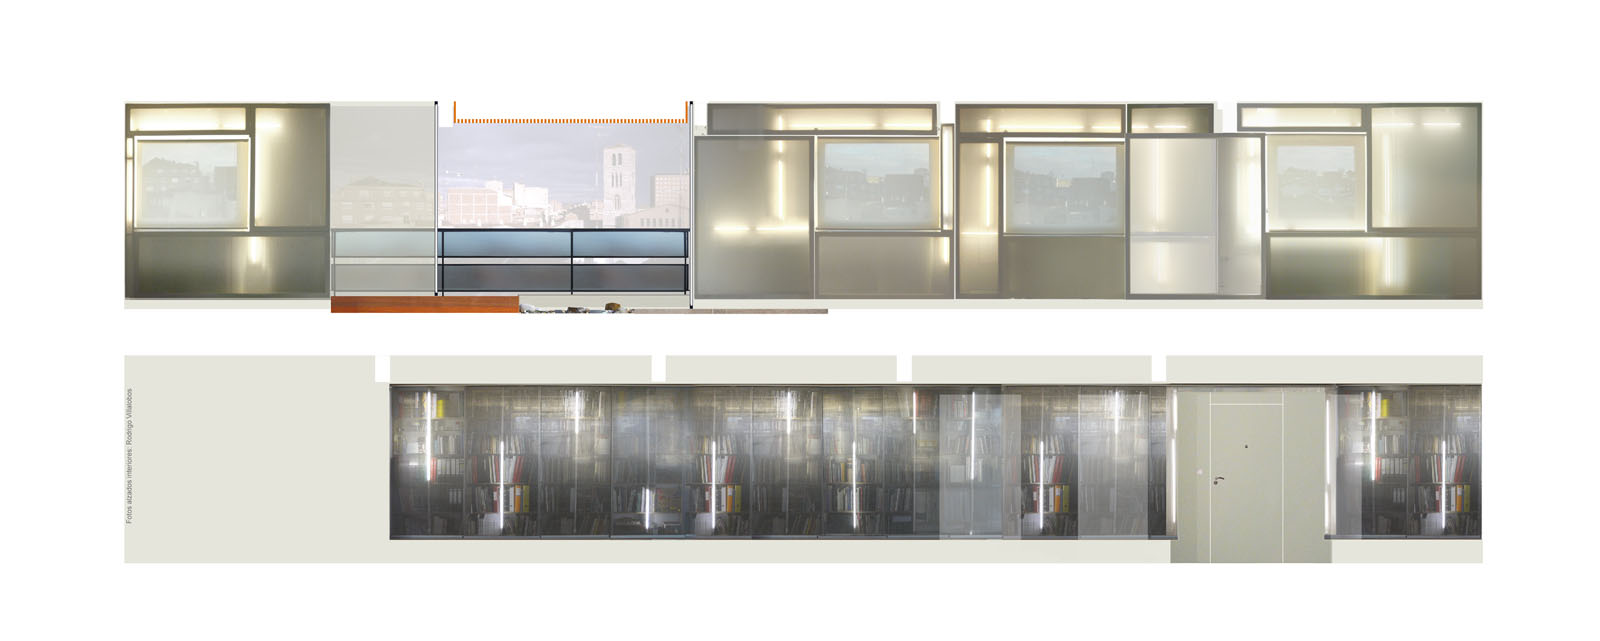 danielvillalobos-architecturexxithcentury-spanisharchitecture-9